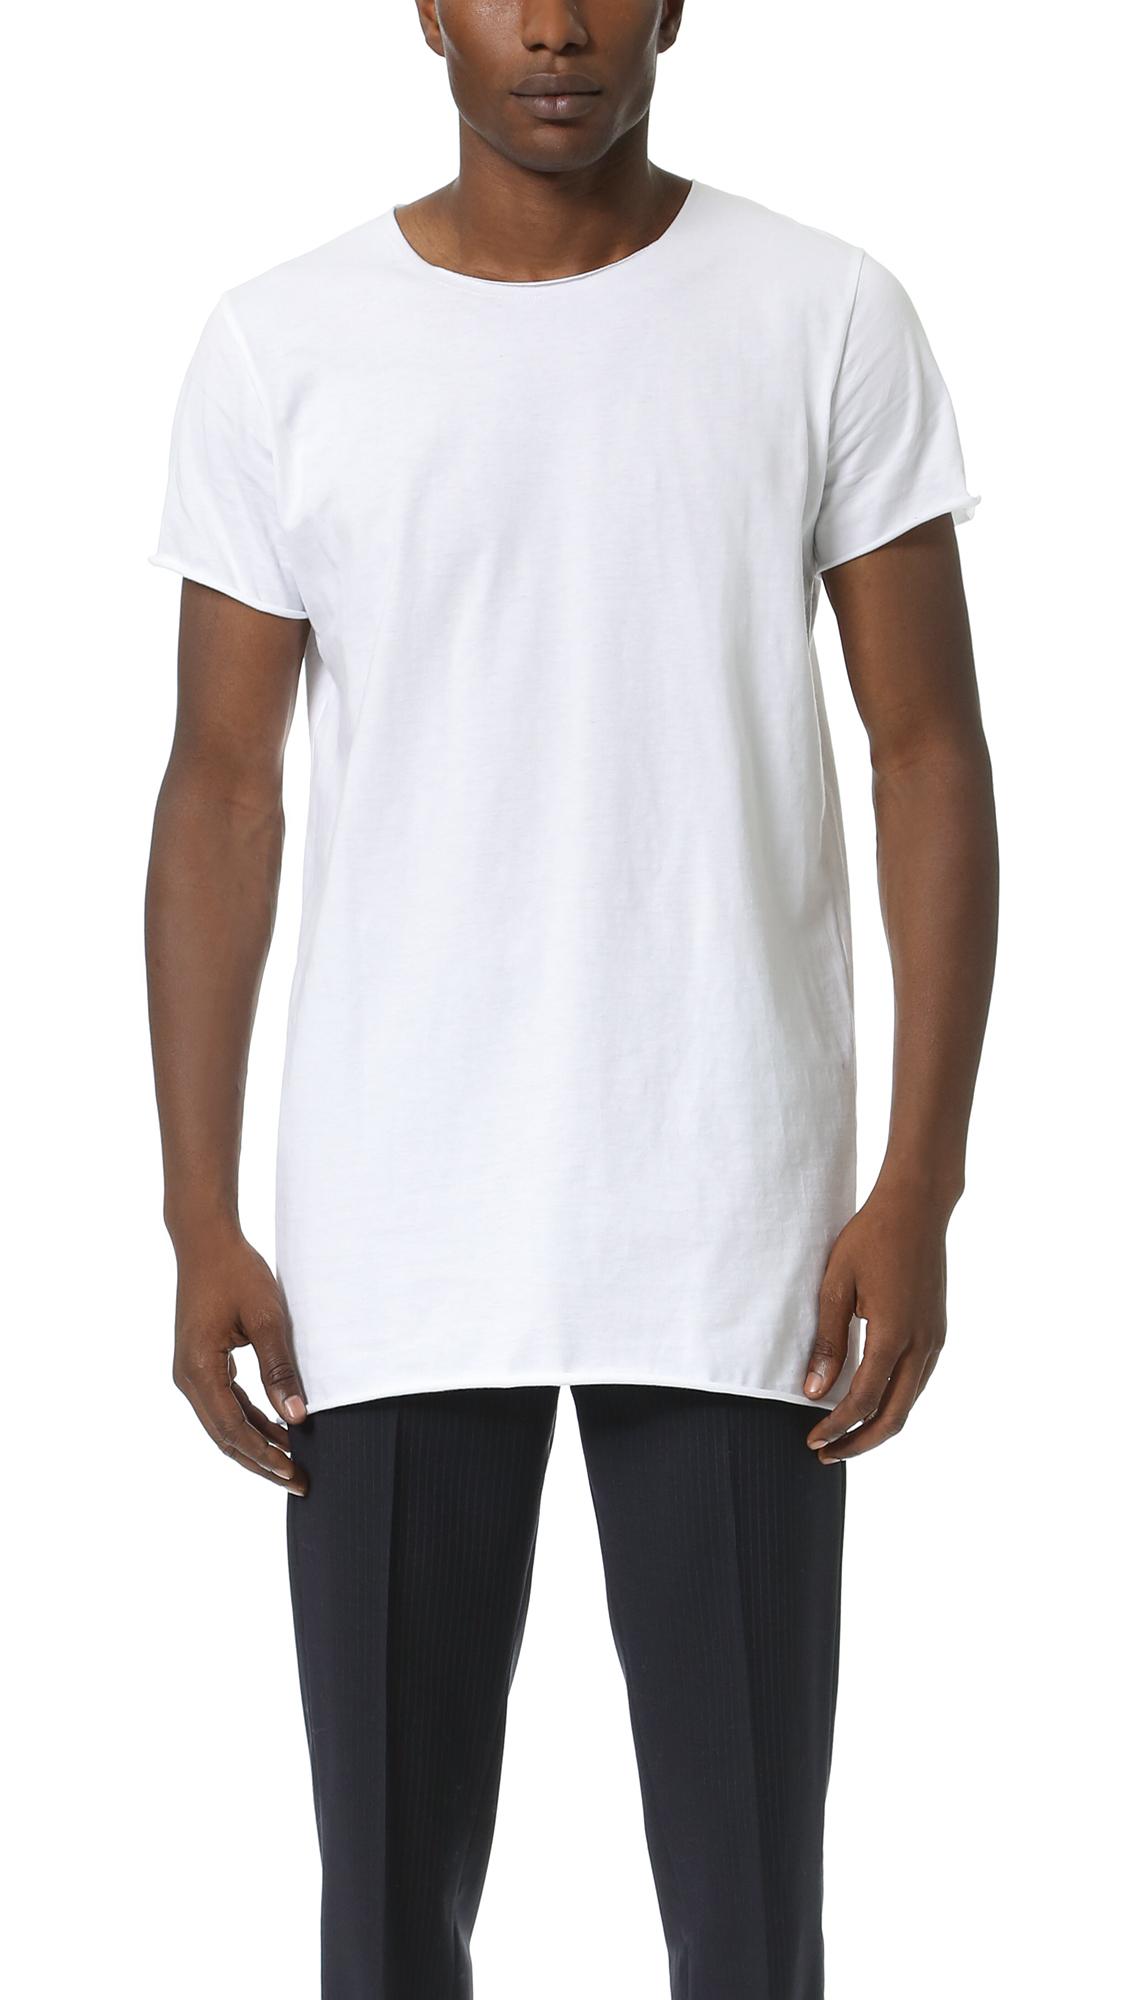 Camiseta Hundred hombre Camiseta Hundred Camiseta Won hombre hombre Won Hundred Won Tq6pYwp